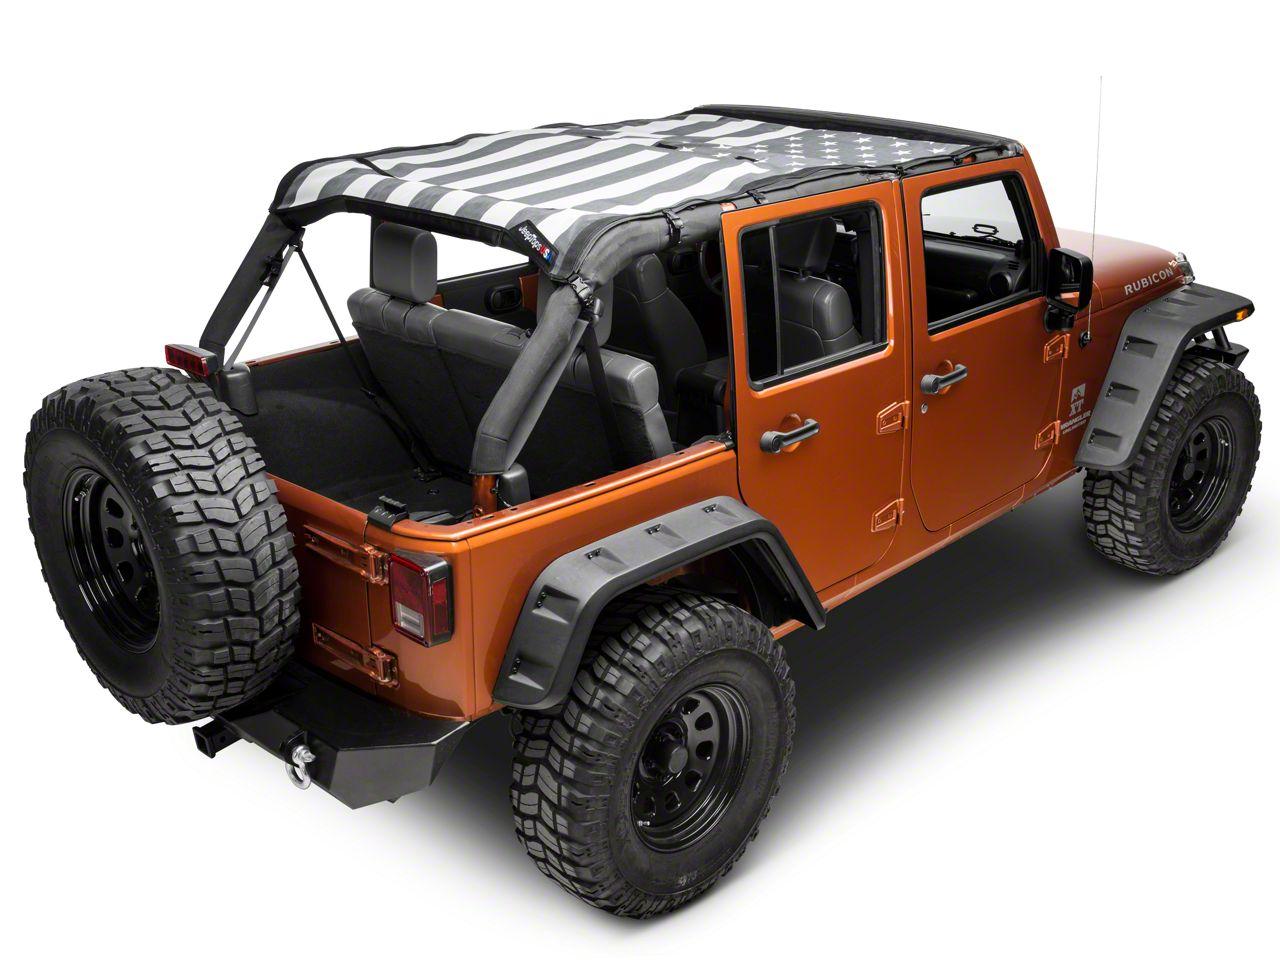 JTopsUSA Safari Mesh Top - Tactical American Flag (07-18 Jeep Wrangler JK 4 Door)